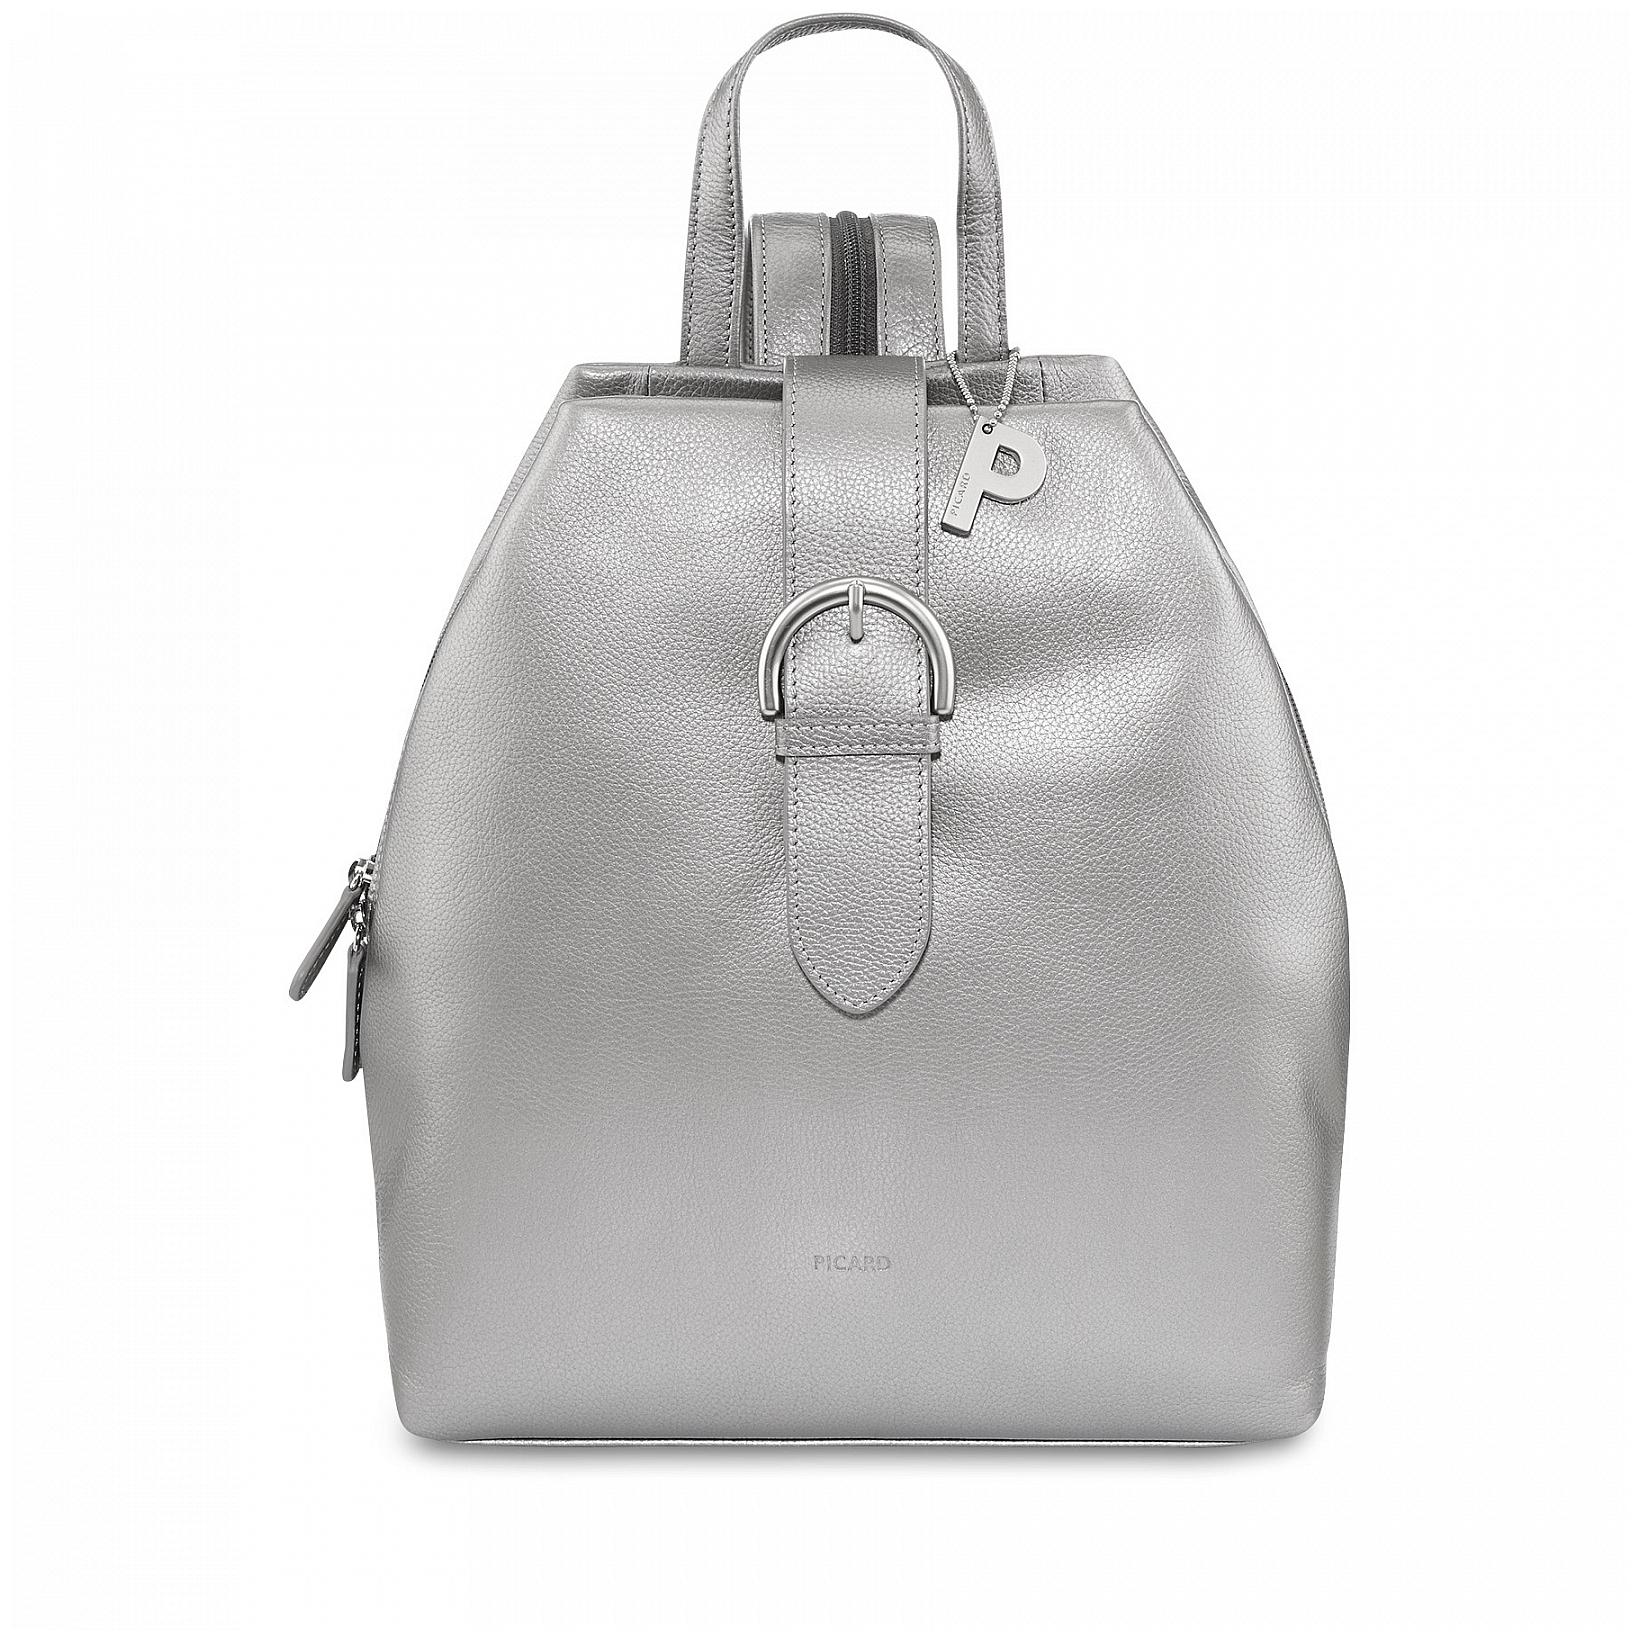 f71e82ffd2c PICARD Dámský kožený batoh do města LUIS 8386 stříbrný